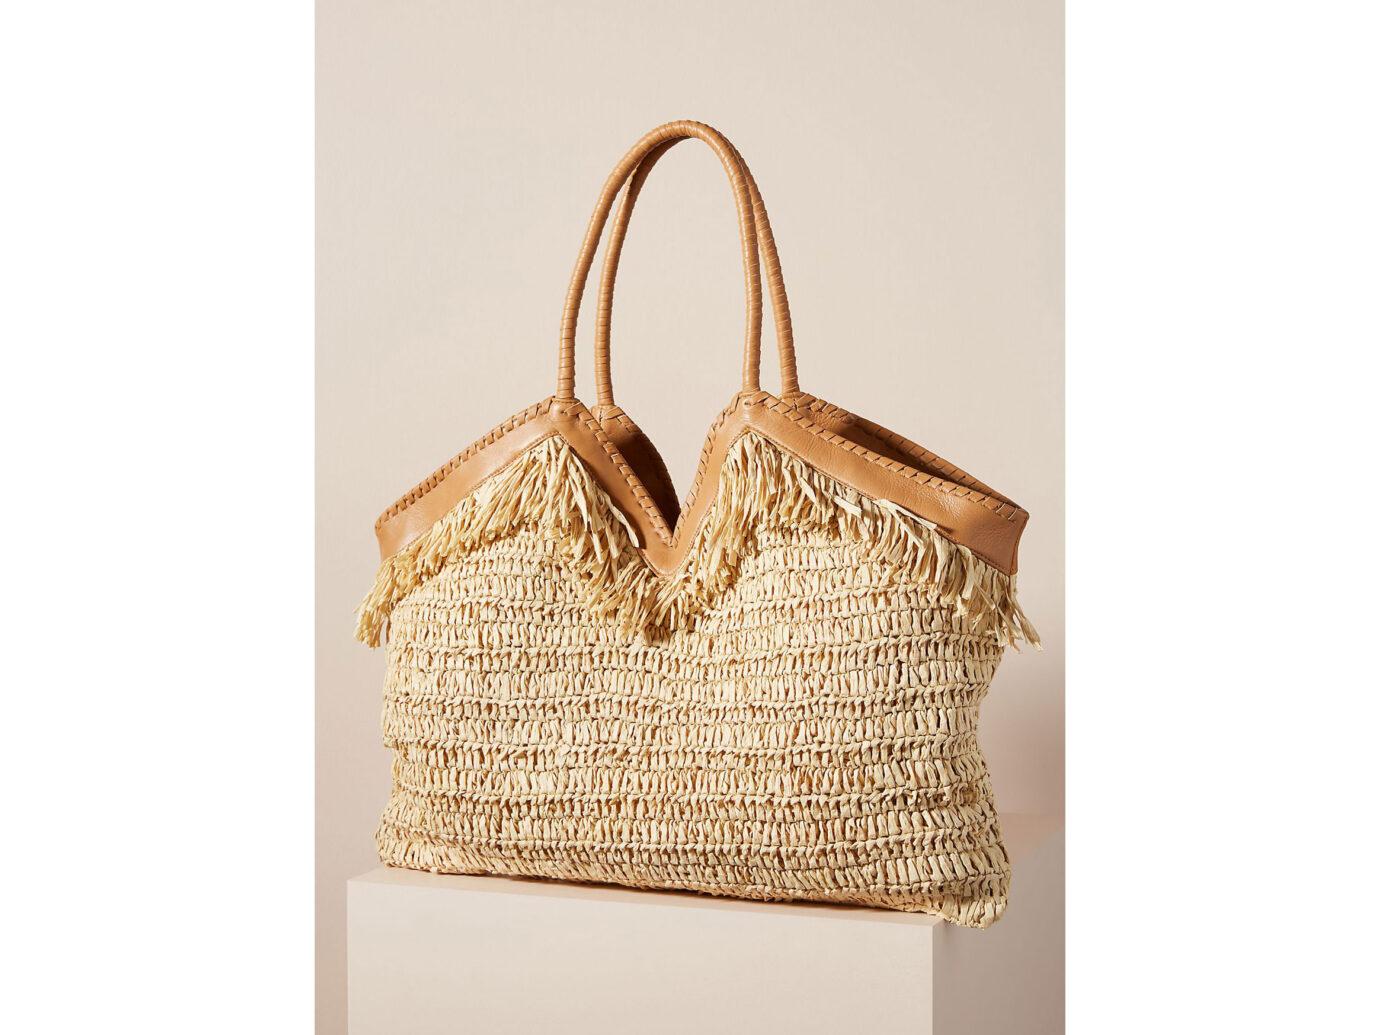 Anthropologie straw beach bag